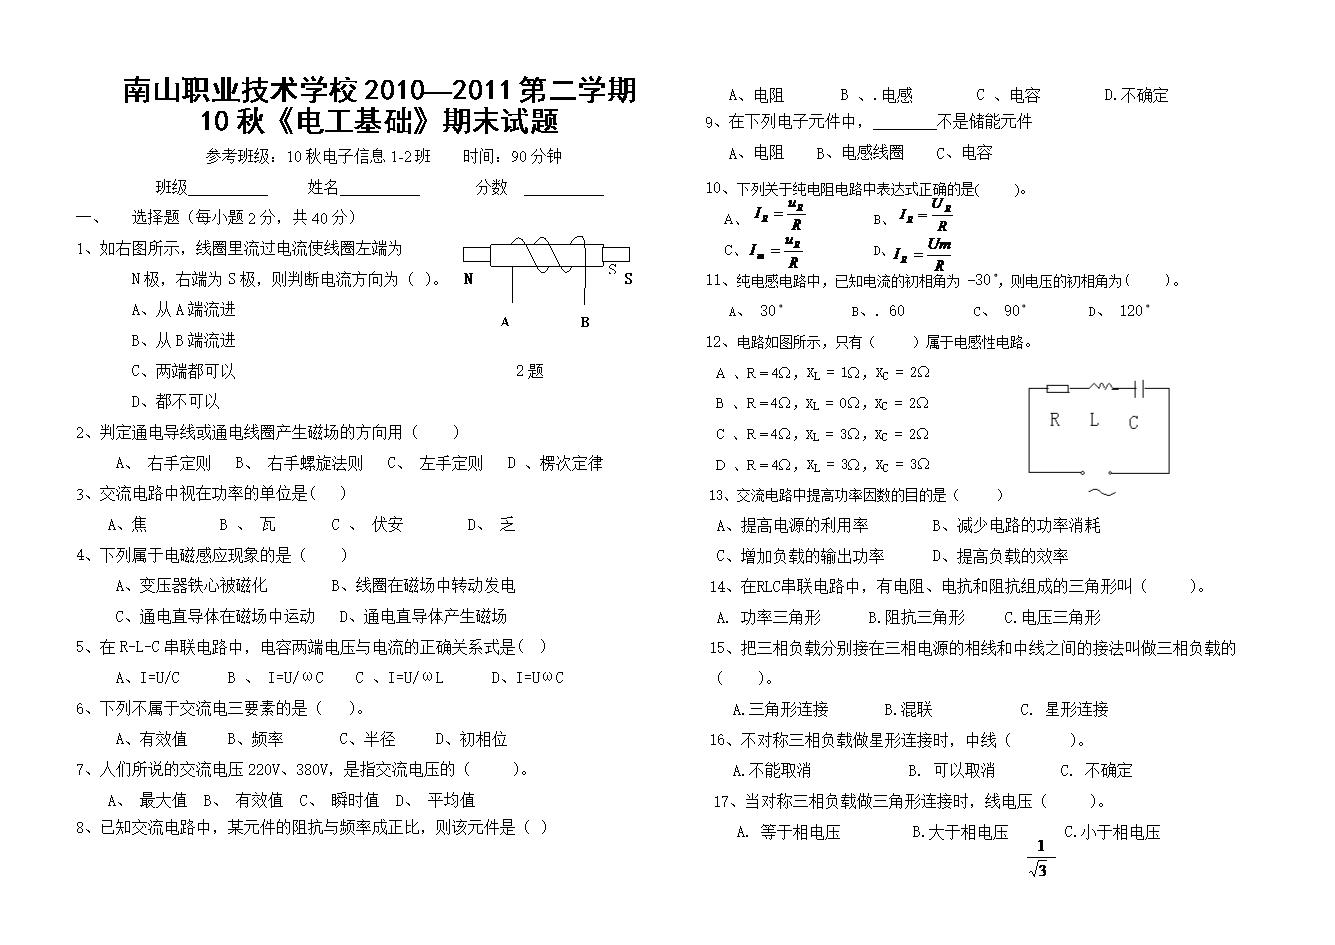 a,b,c,d,11,纯电感电路中,已知电流的初相角为-30o,则电压的初